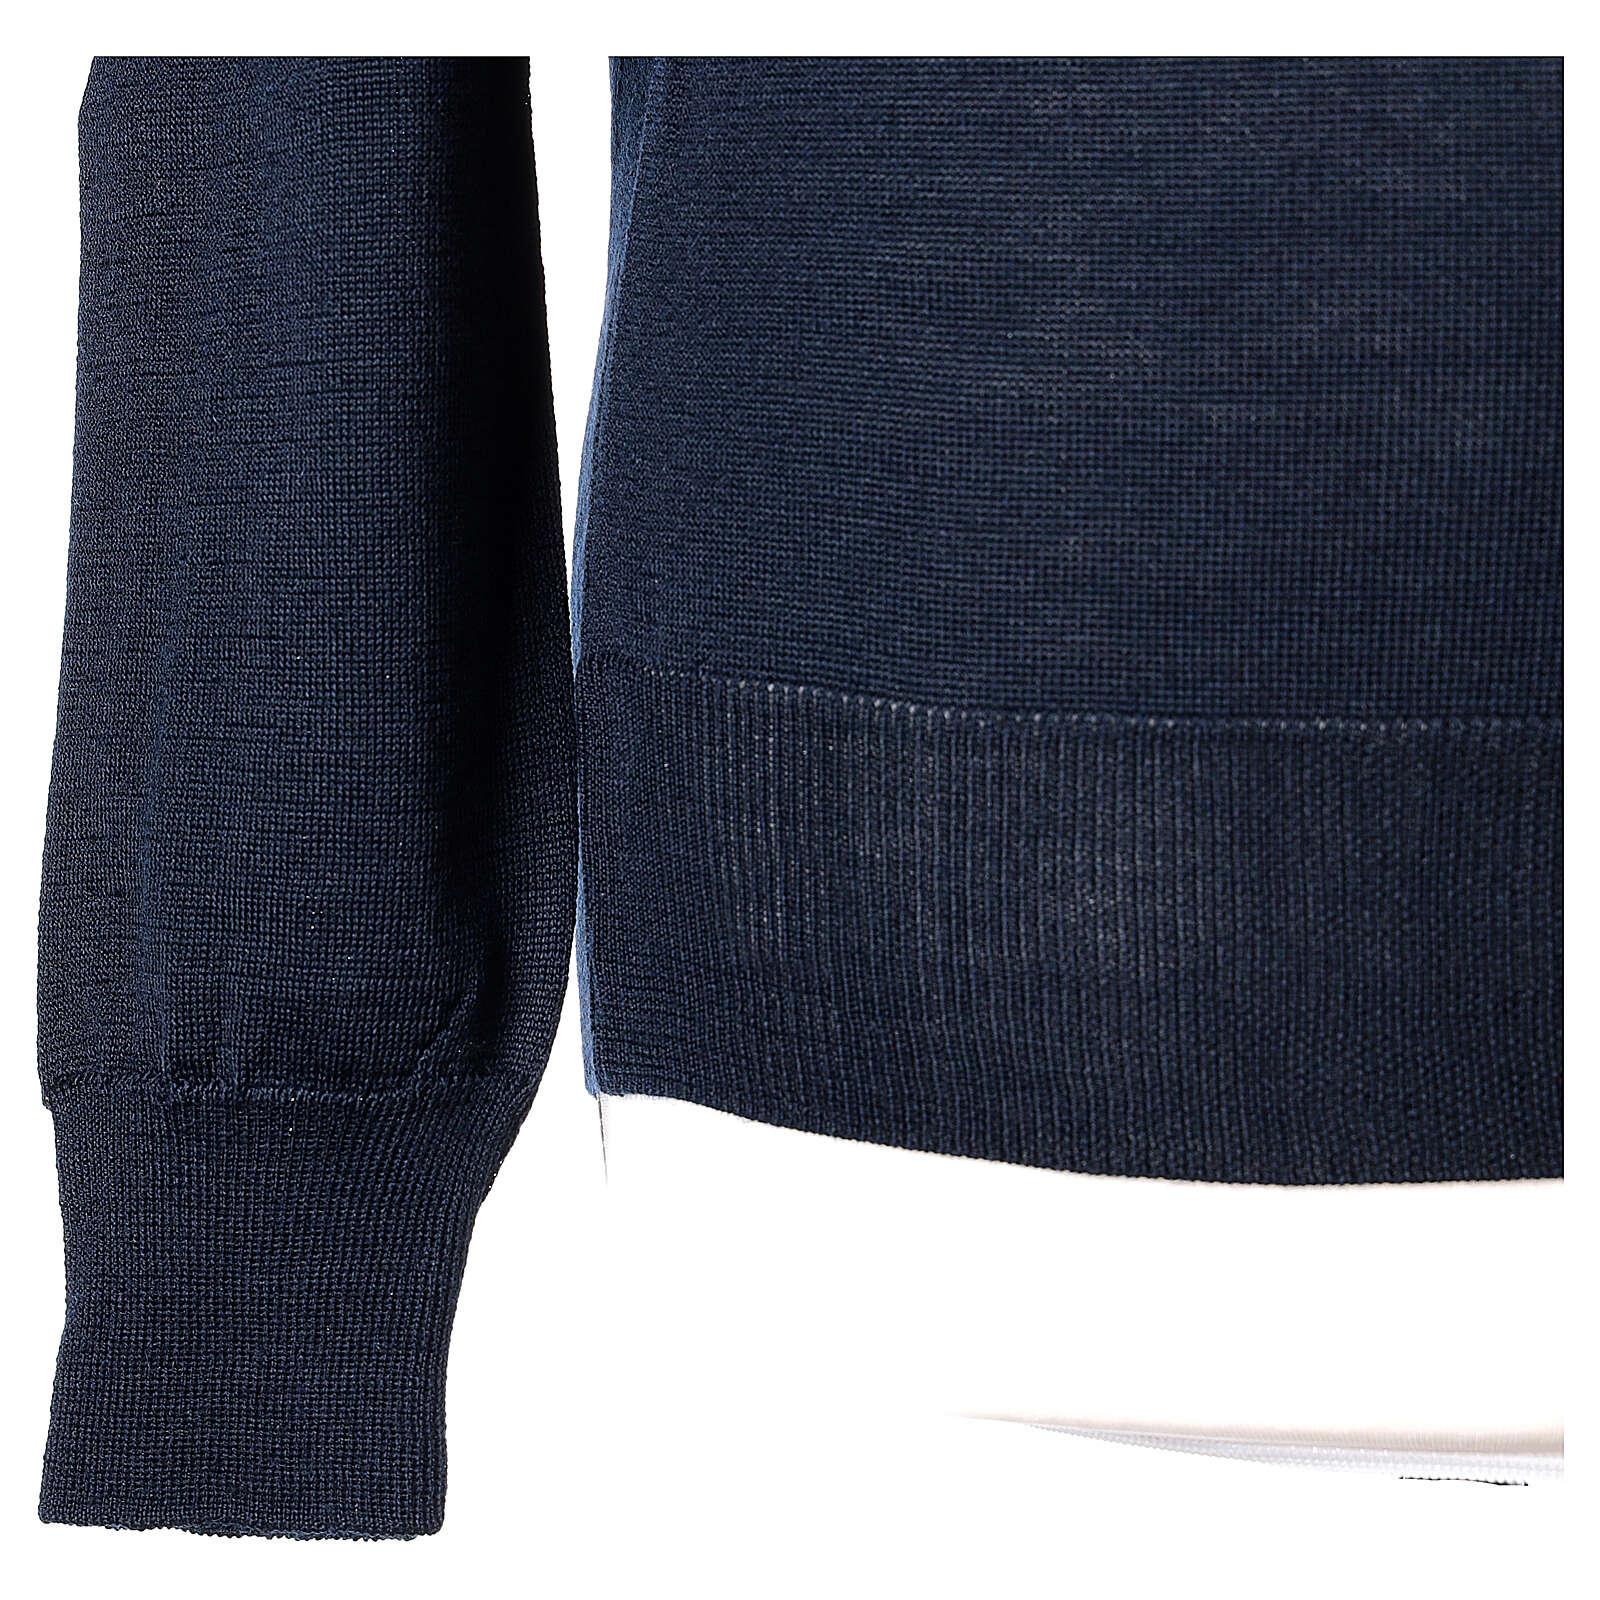 Pulôver sacerdote azul escuro gola redonda tricô plano 50% lã de merino 50% acrílico In Primis 4